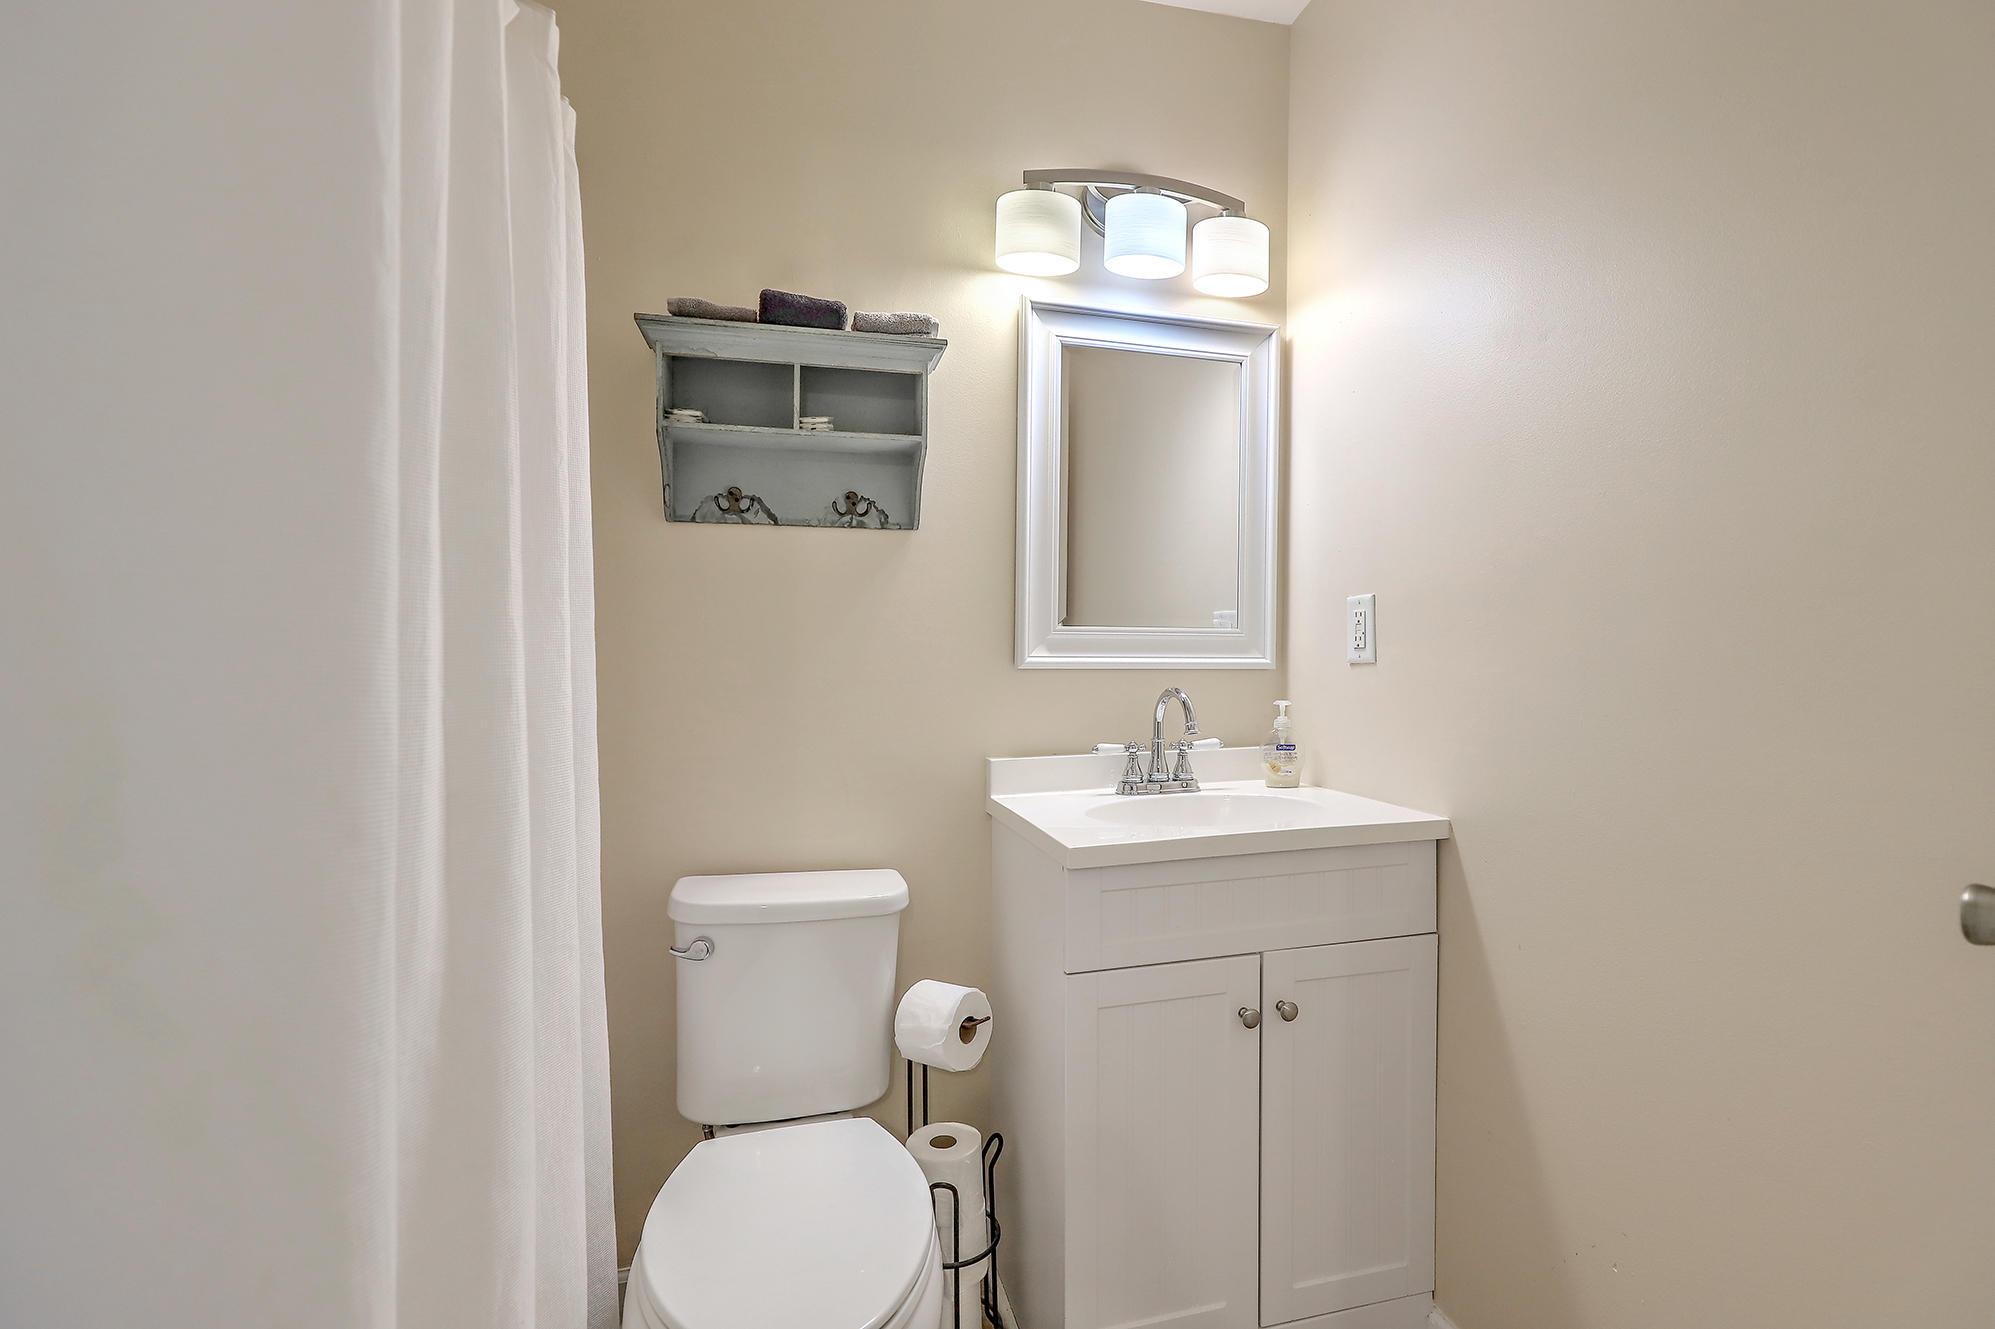 Marsh Grass Condominiums Homes For Sale - 1501 Ben Sawyer, Mount Pleasant, SC - 7